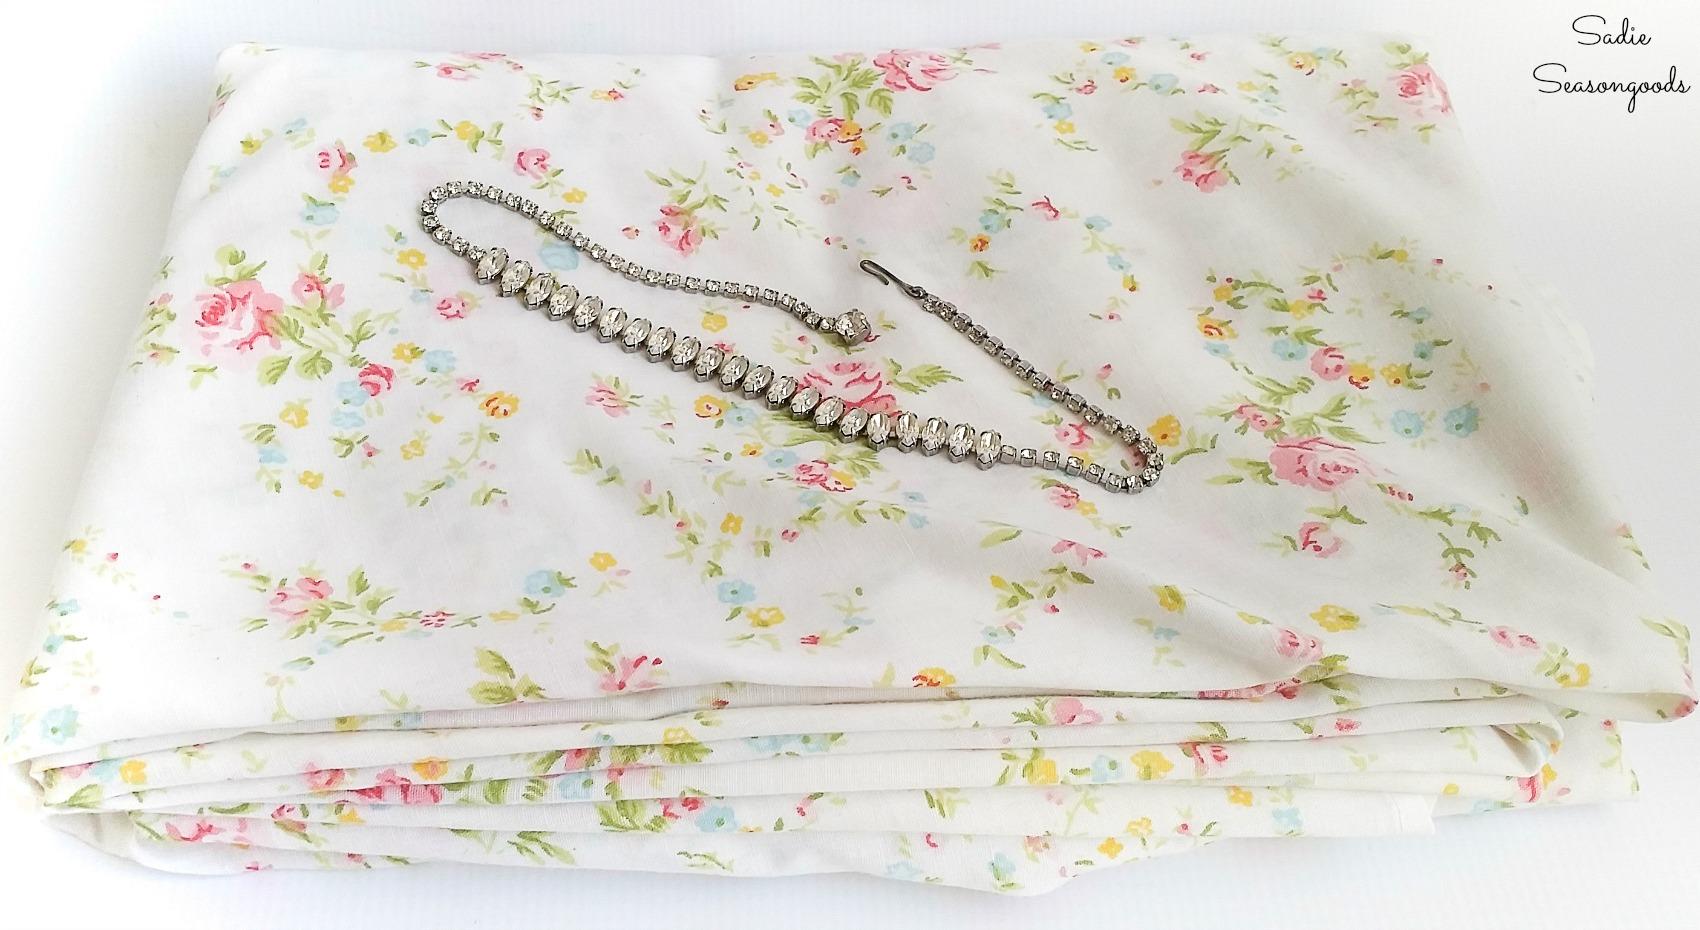 Vintage sheets and broken jewelry to make the Boho bracelets